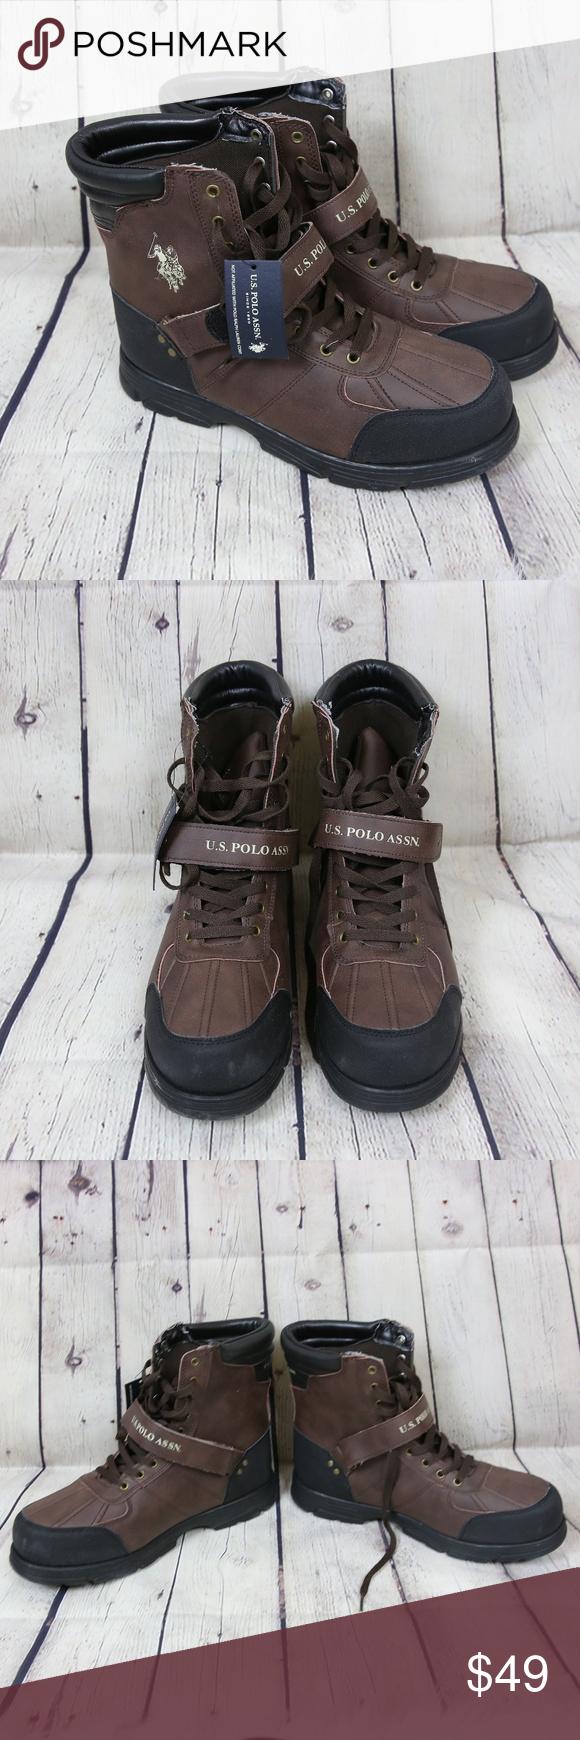 c3756550ad9 U.S. Polo Assn. Shoes | Us Polo Assn Crusade 2 Hi Leather Lace Up ...